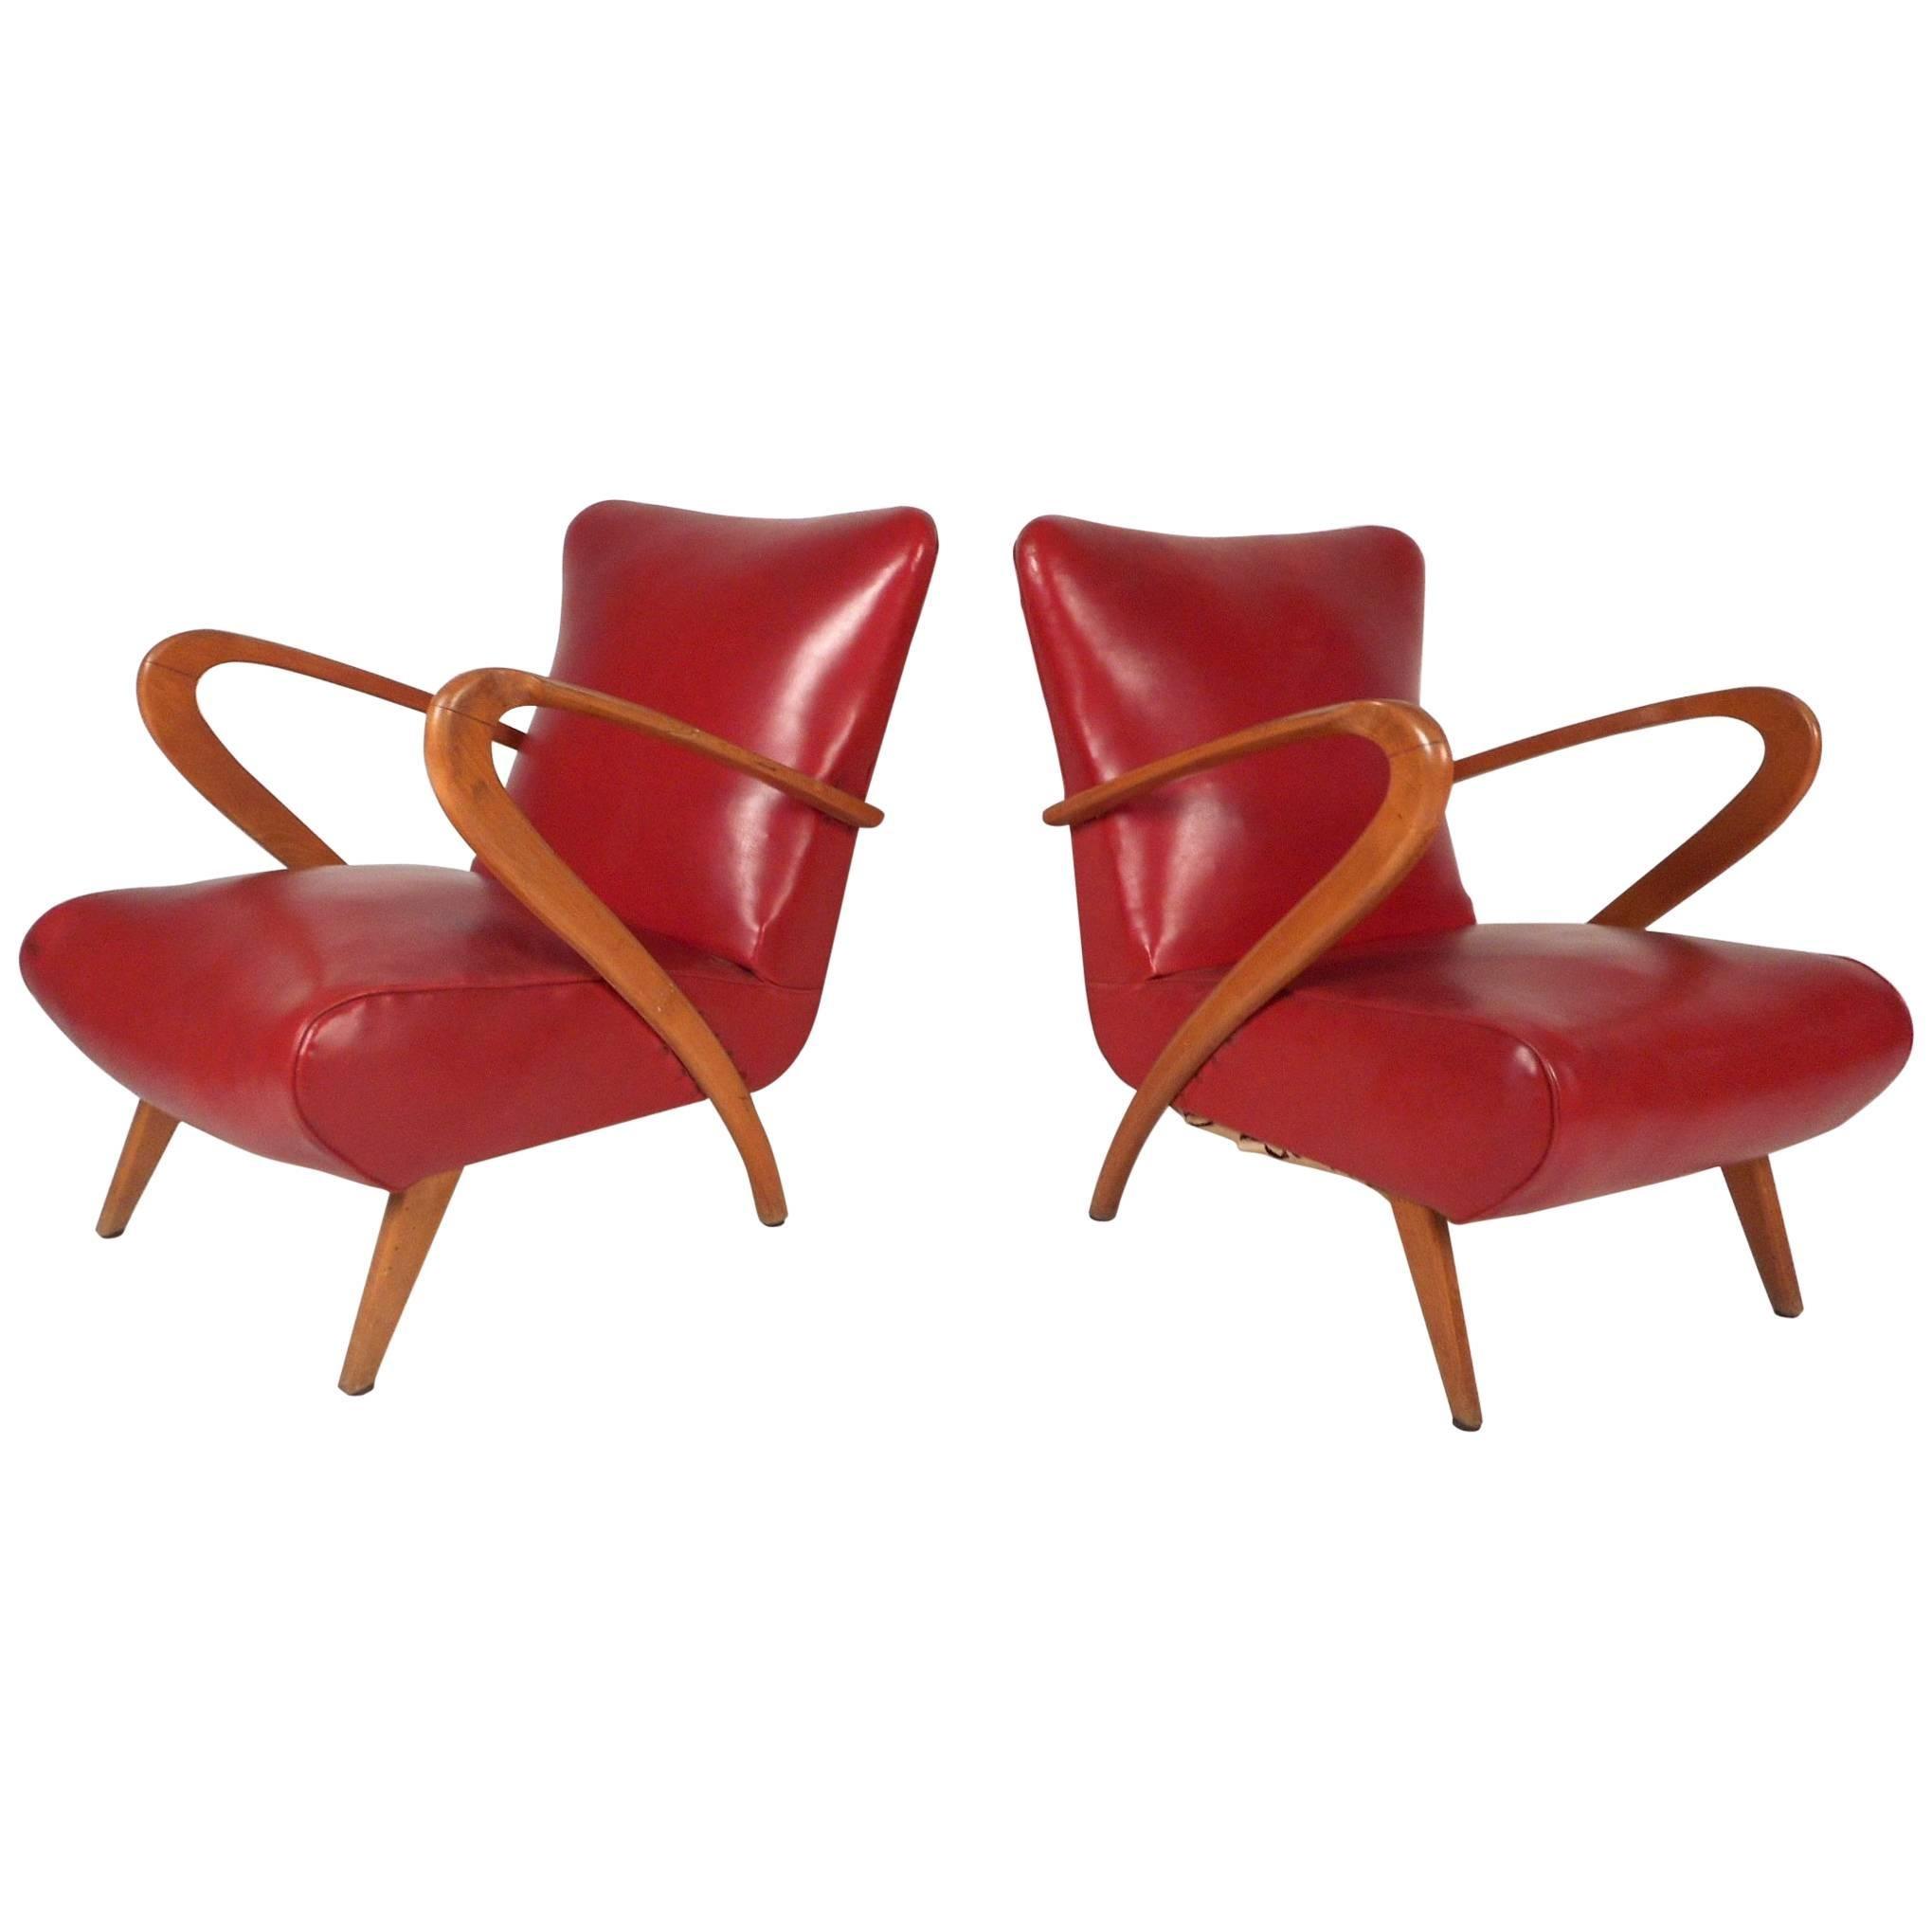 Pair of Mid-Century Modern Italian Lounge Chairs by Paolo Buffa